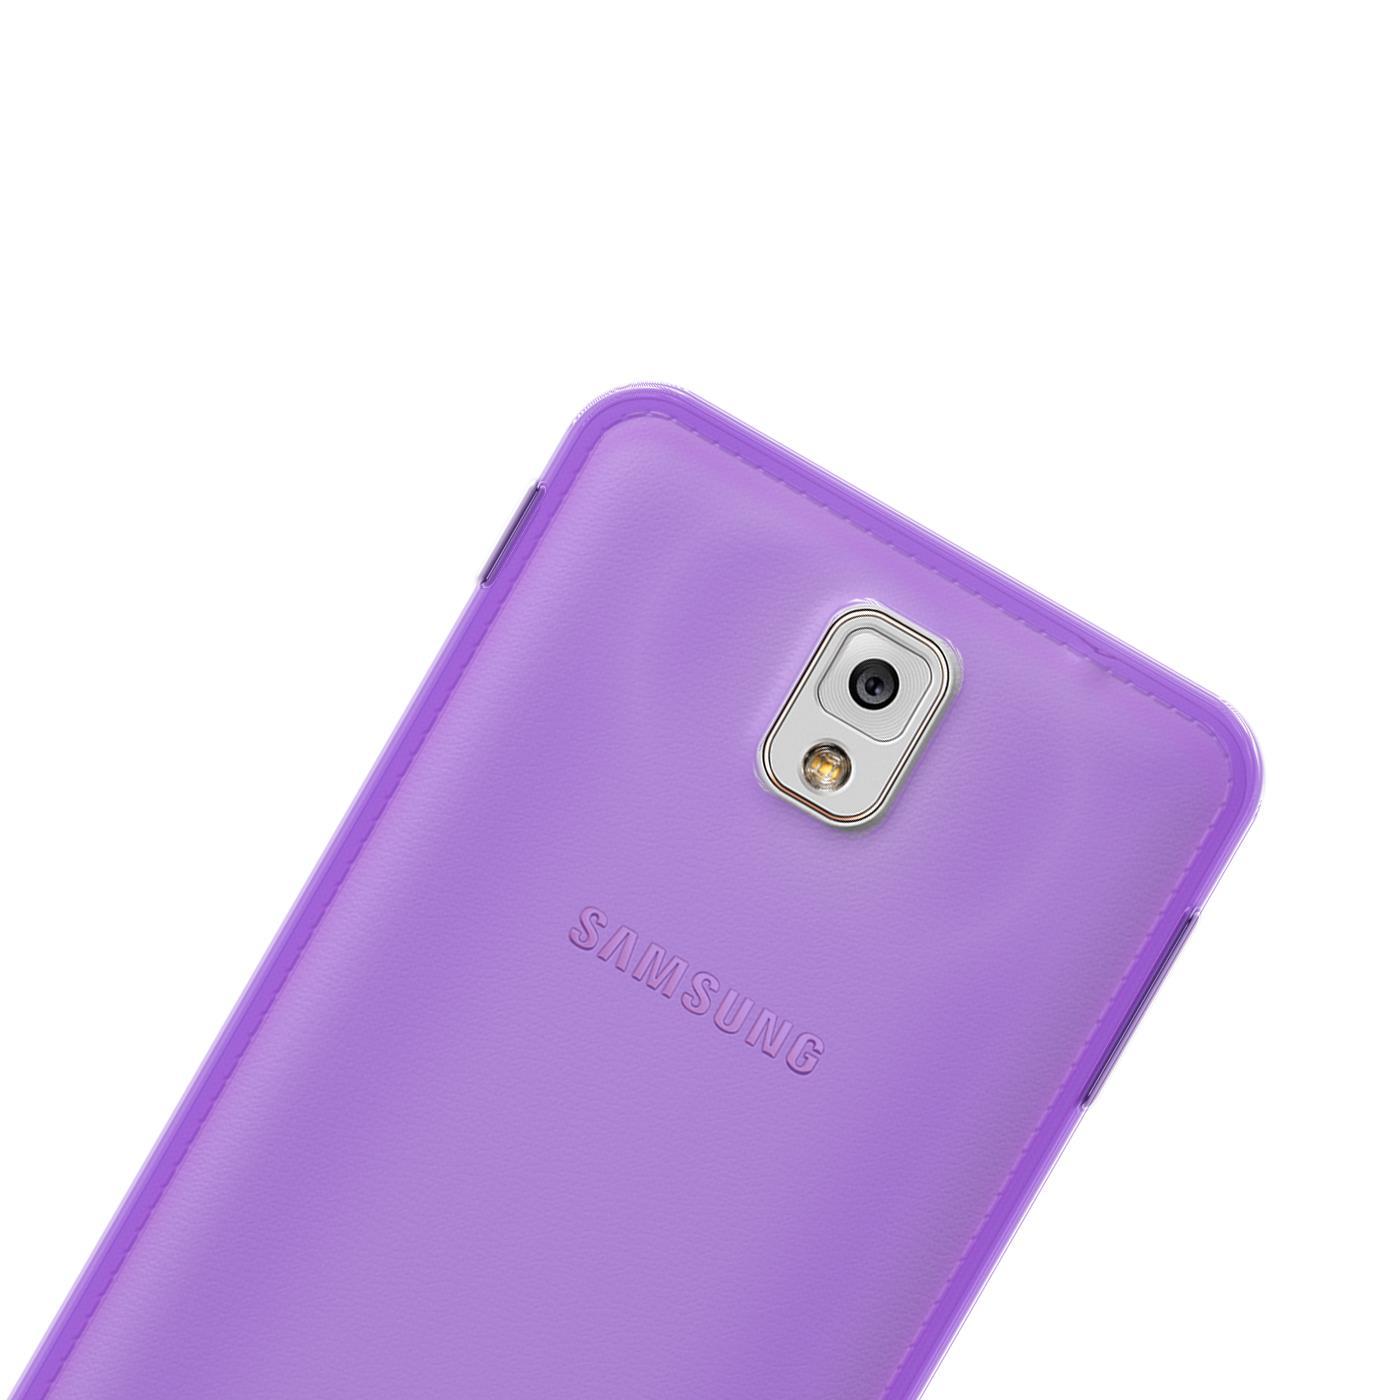 Samsung-Galaxy-Note-4-Thin-Silikon-Klar-Case-Cover-Ultra-Slim-Stossfeste-Gel Indexbild 22